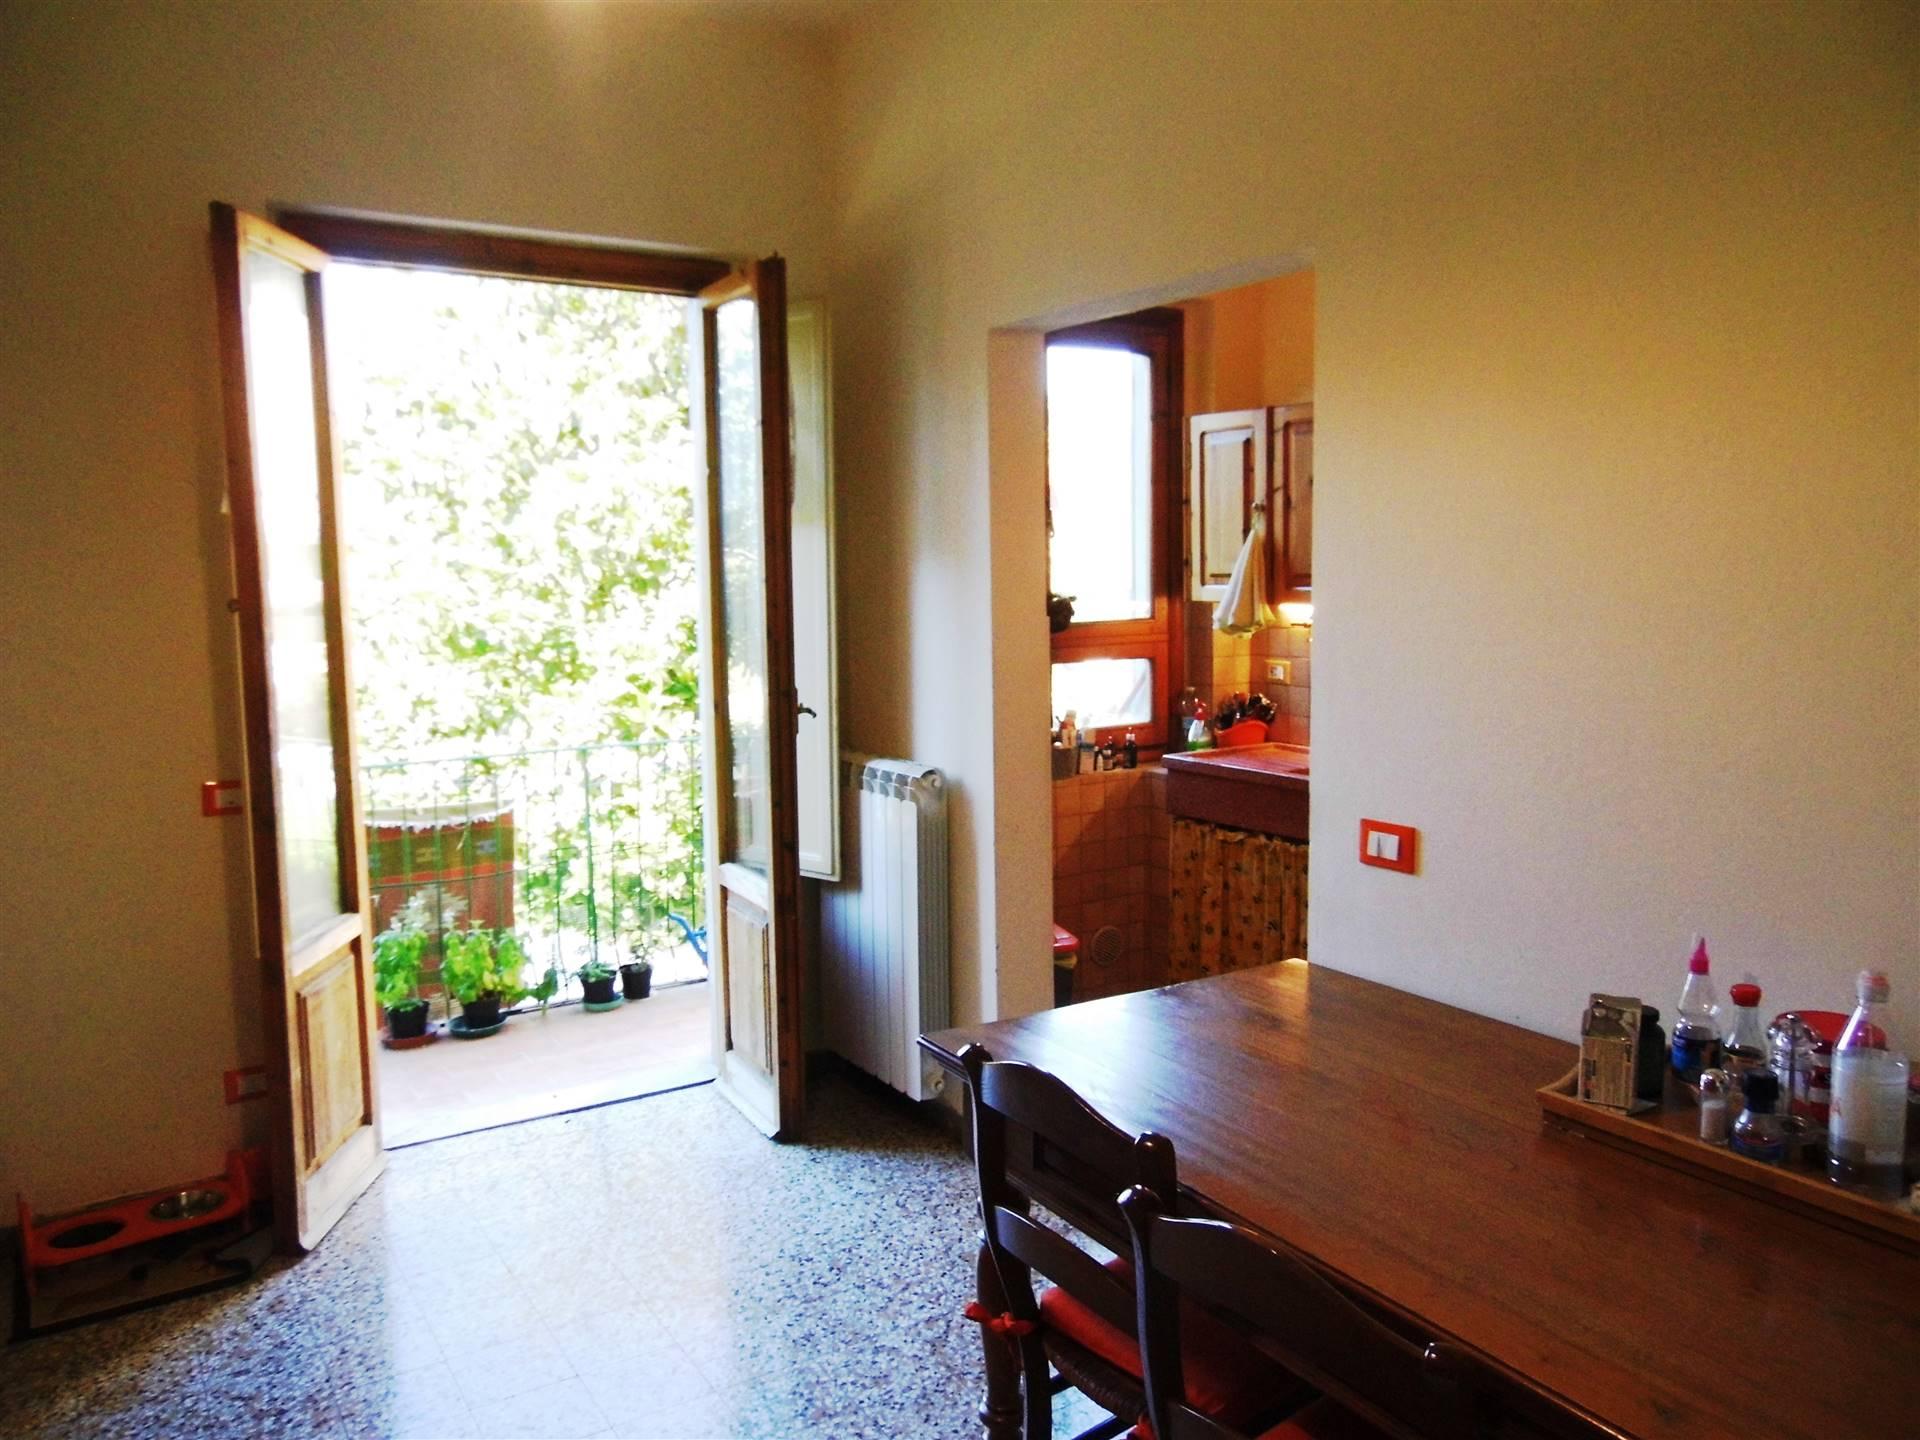 sala pranzo cucinotto e balcone